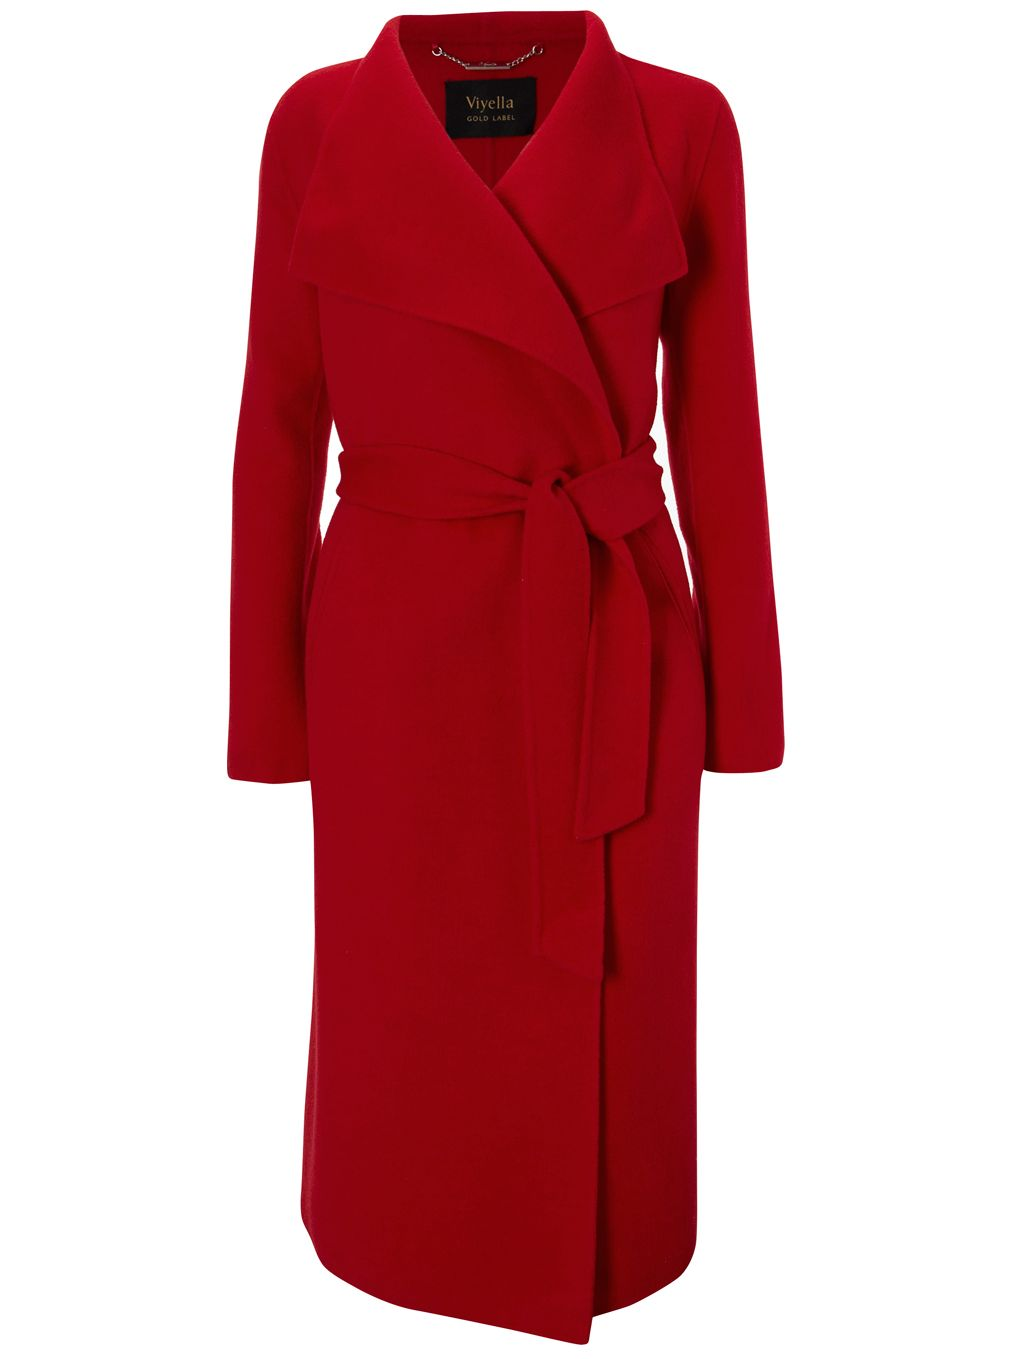 Viyella Long Sleeve Double Faced Wrap Coat, Red at John Lewis